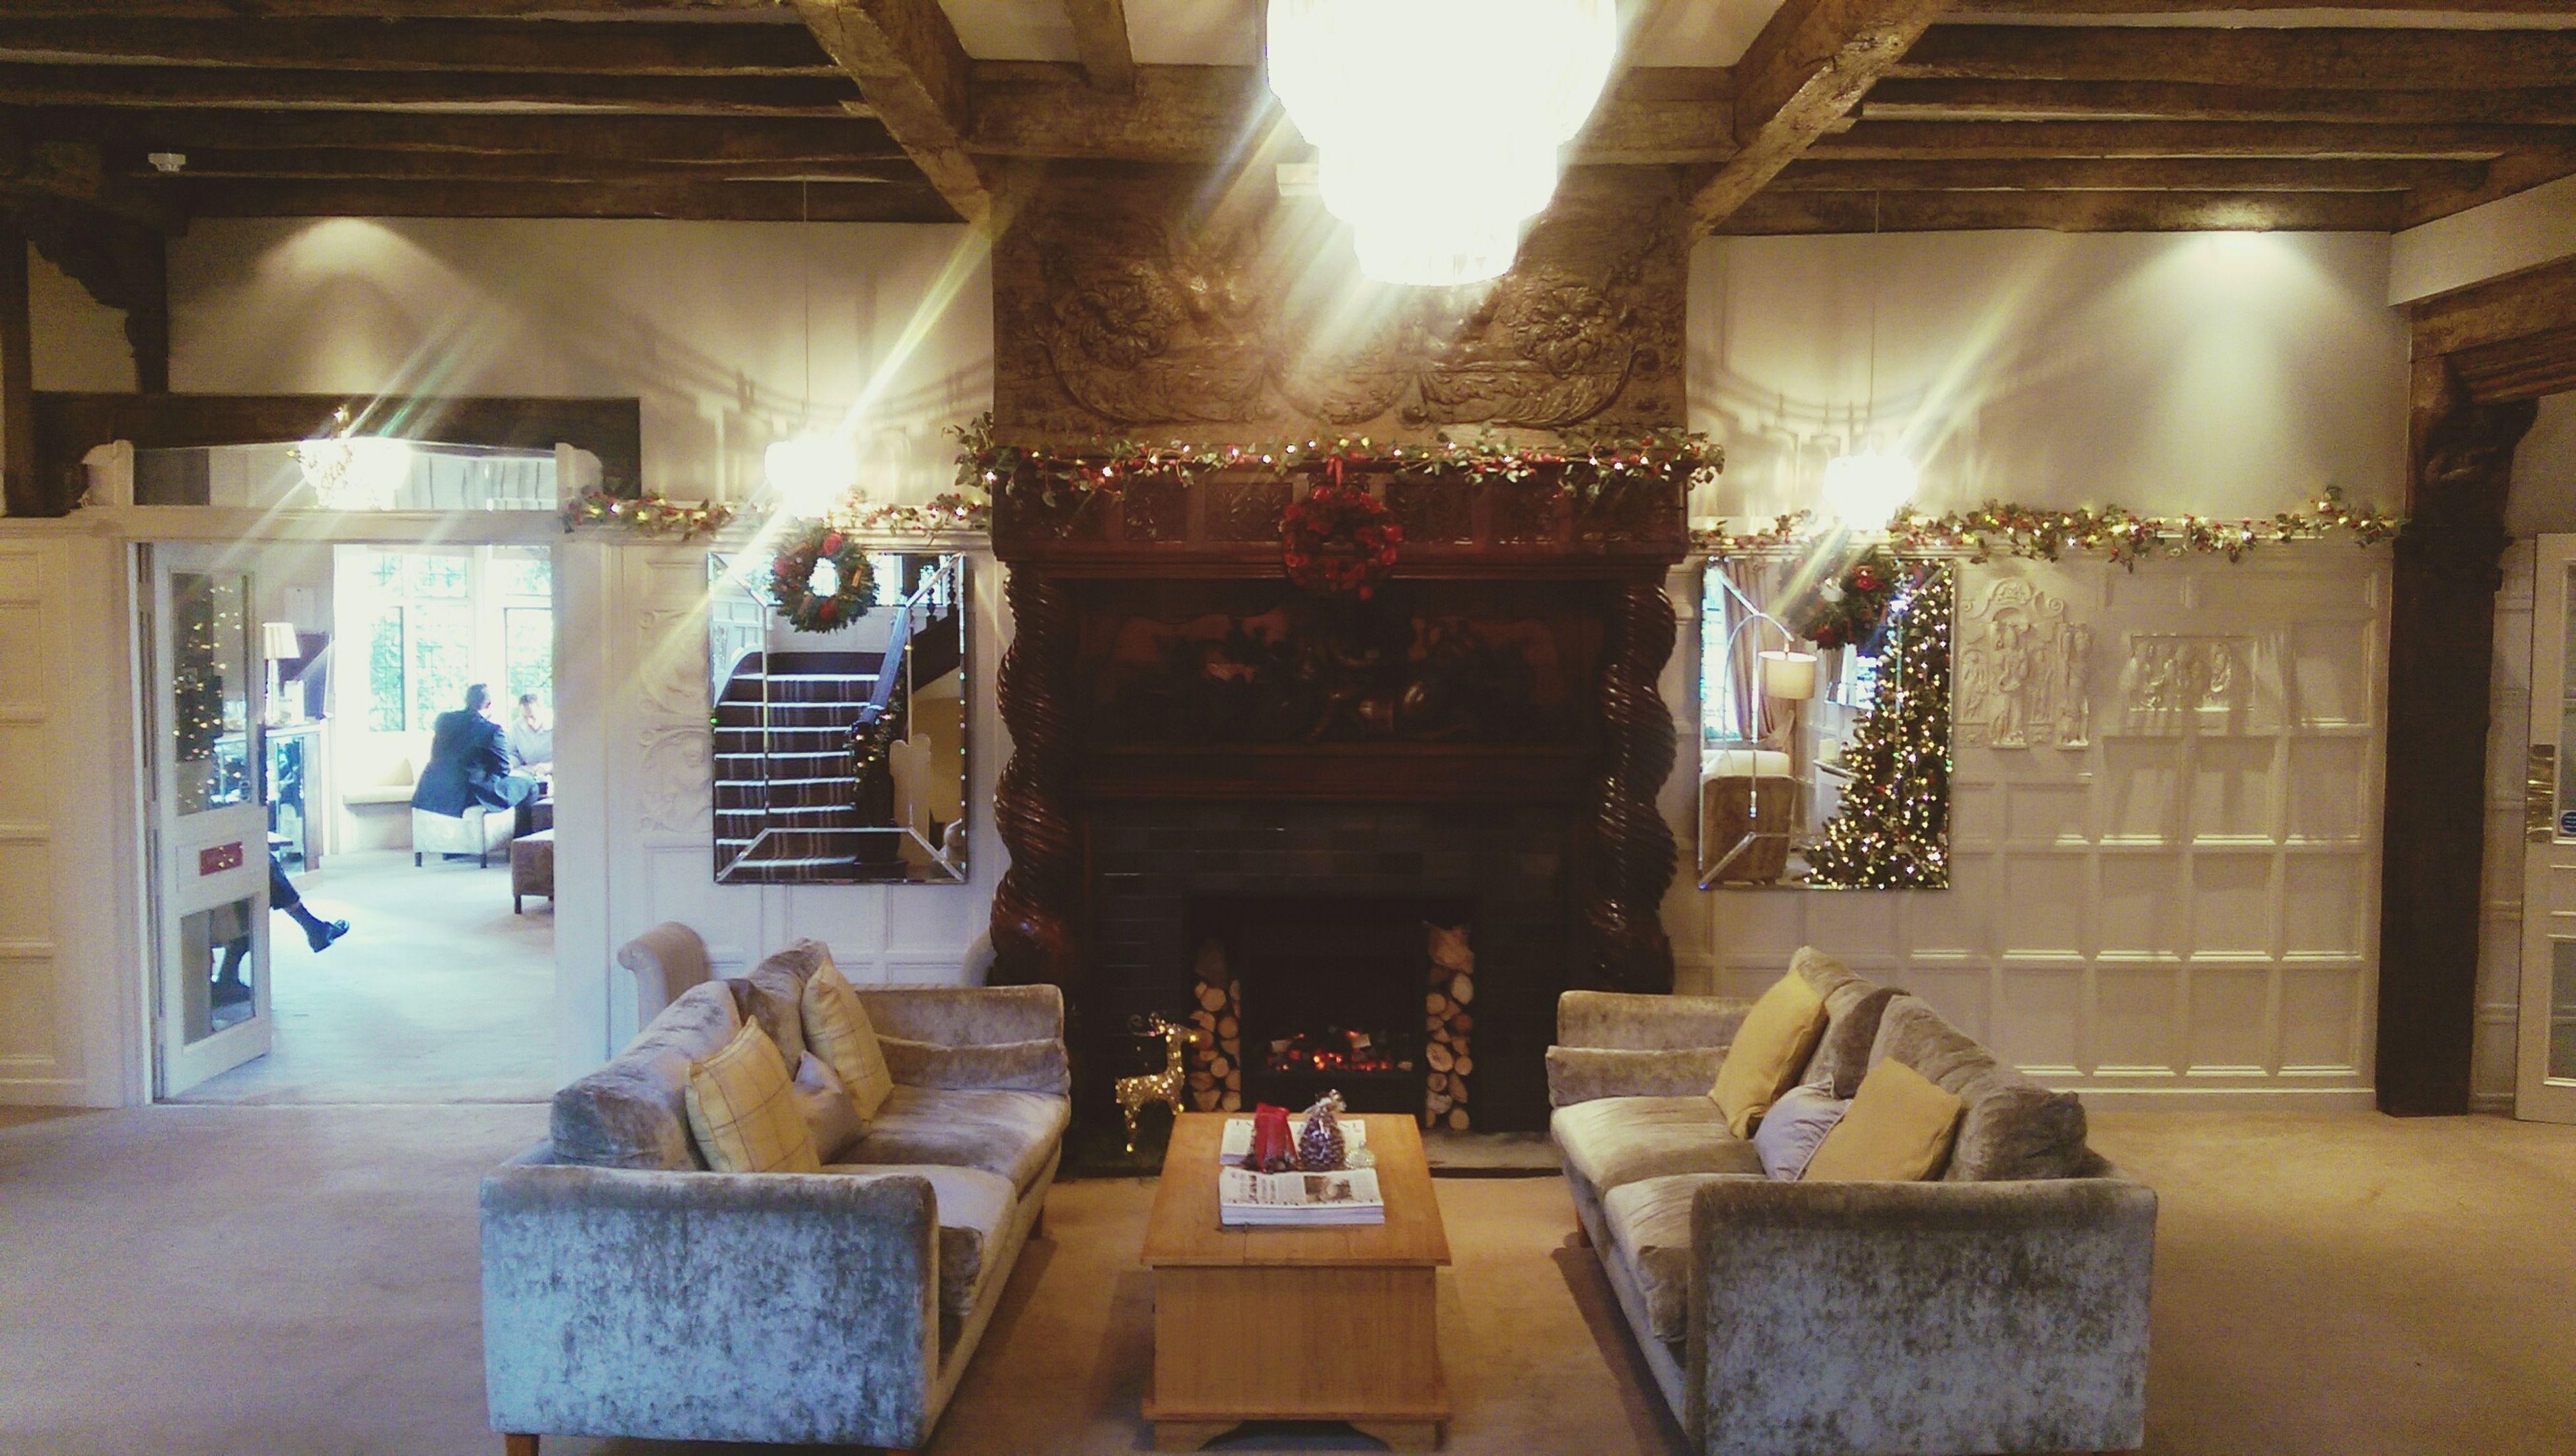 Festive season at Laura Ashley the Manor Lauraashleythemanor Christmastime Xmas Lauraashley Lauraashleyuk Hotel Elstree London